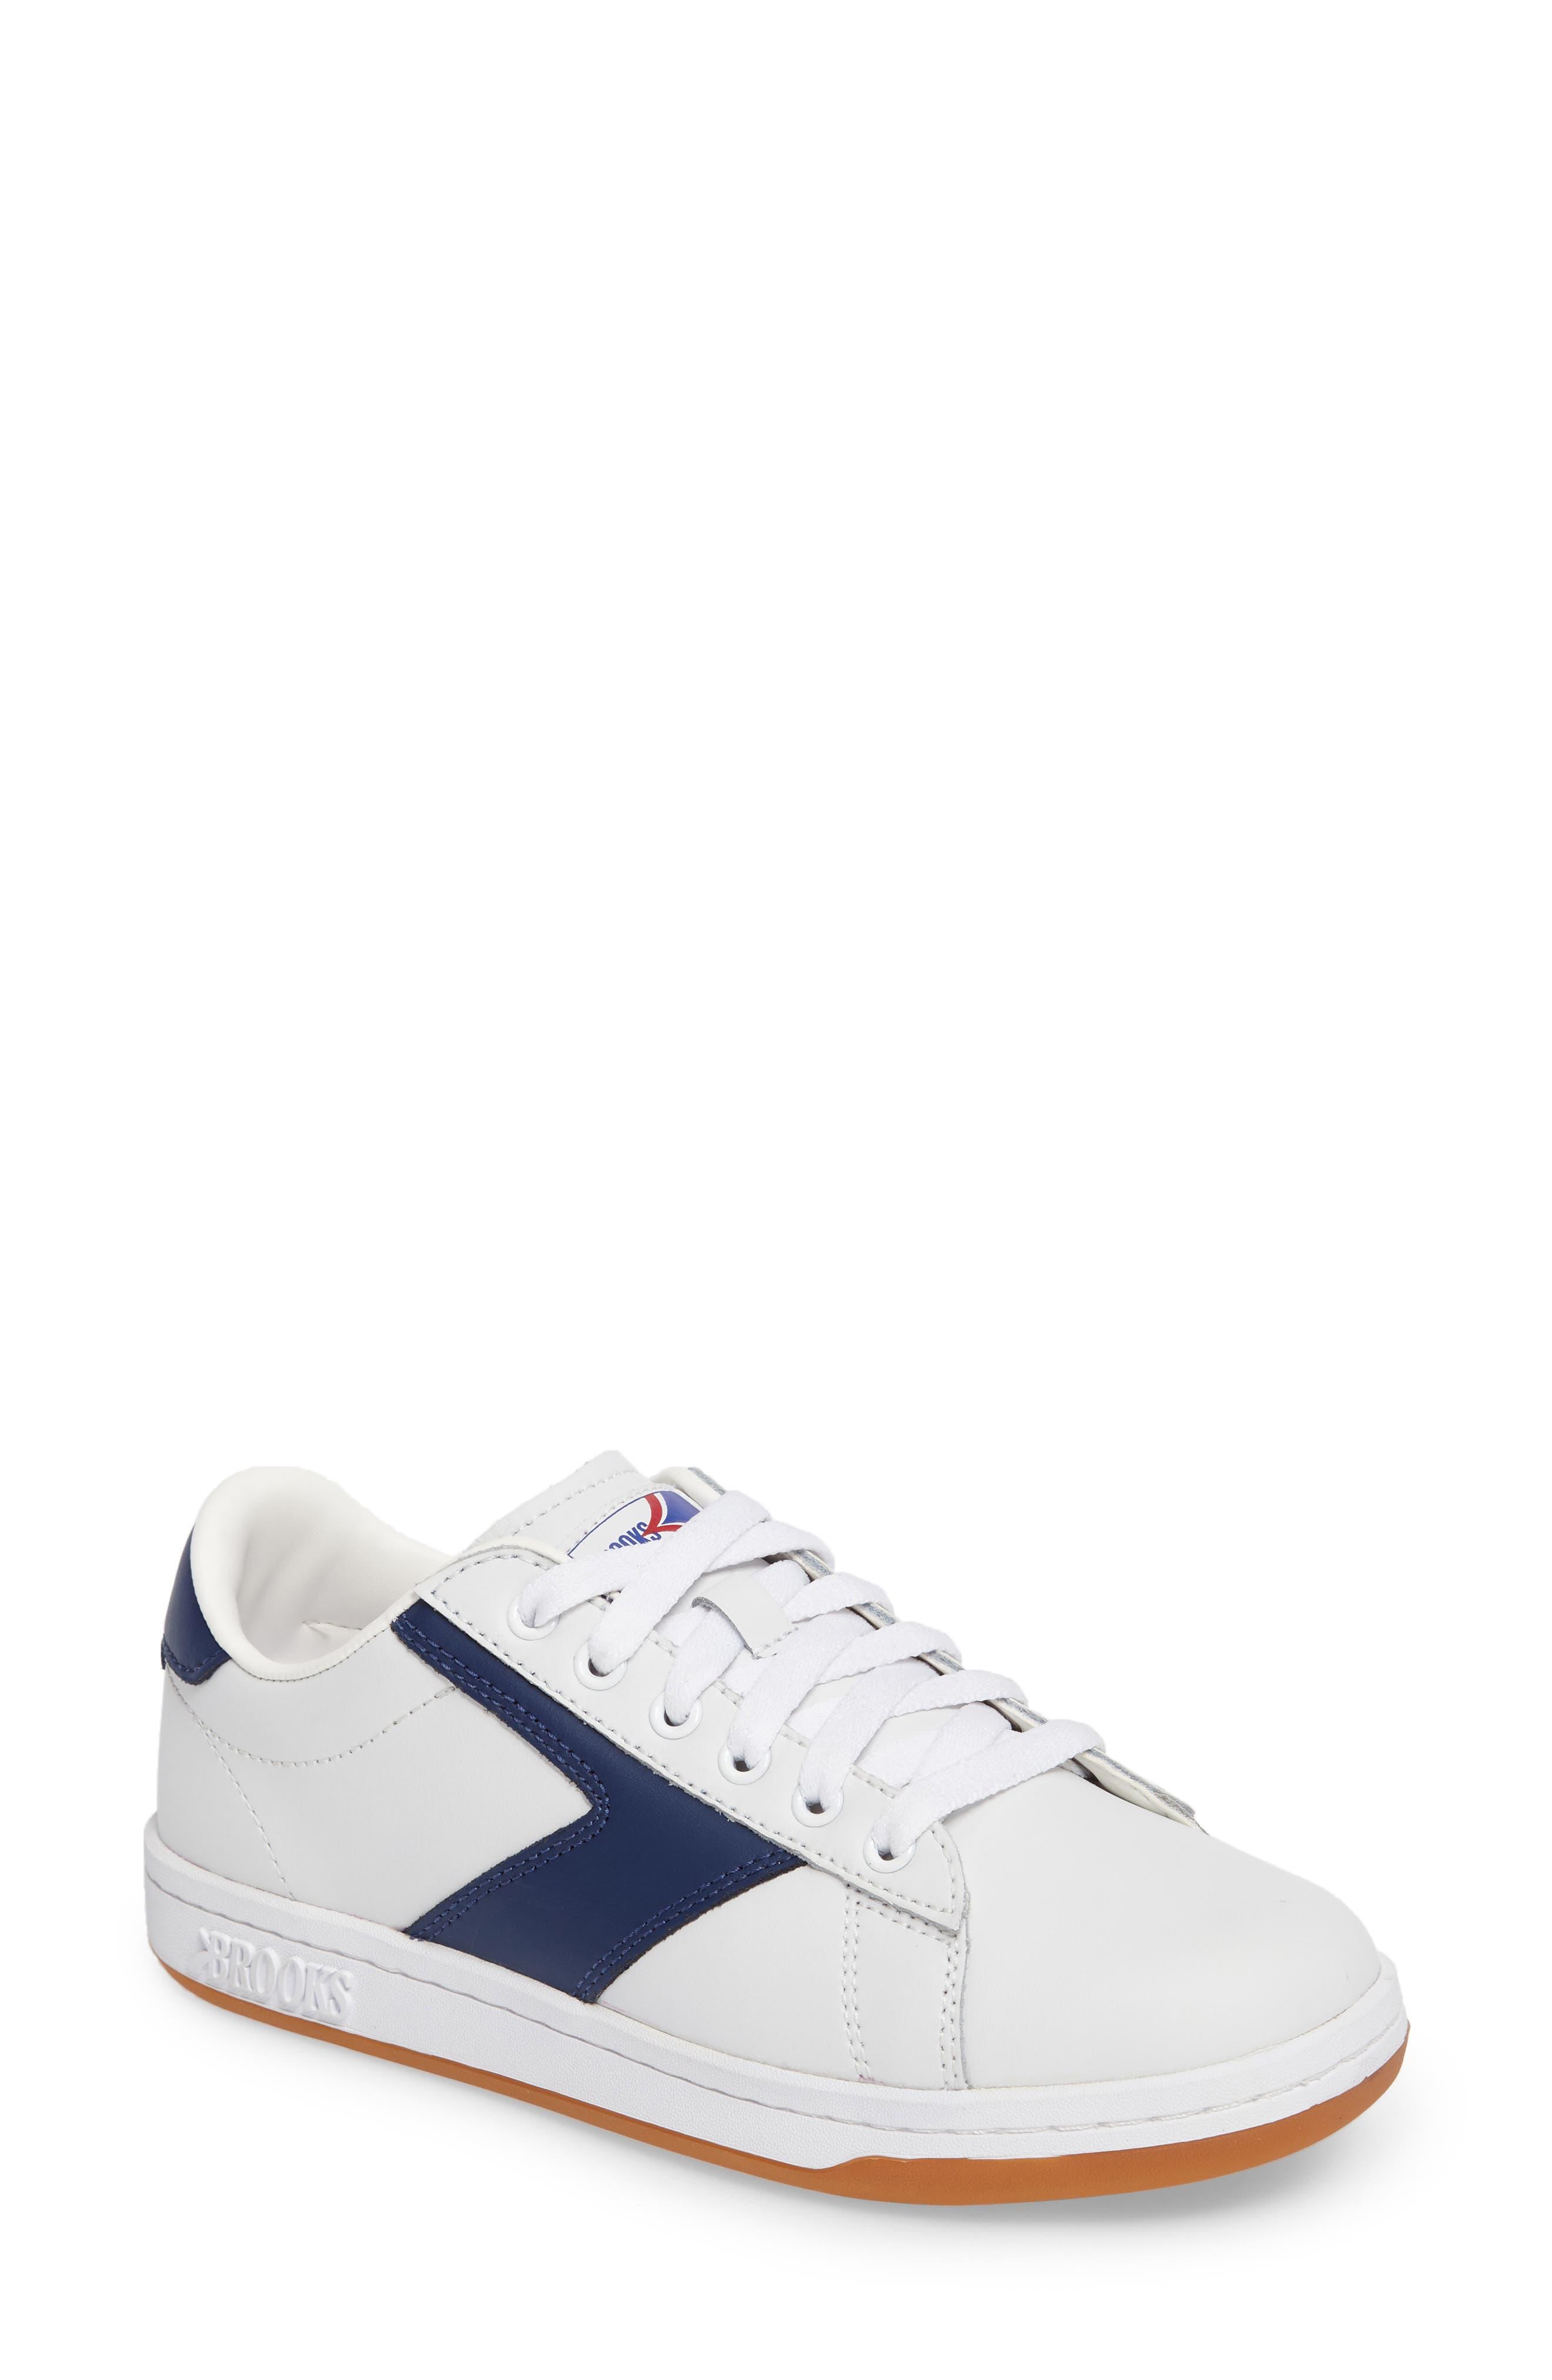 Court Renshaw Sneaker, Main, color, 121